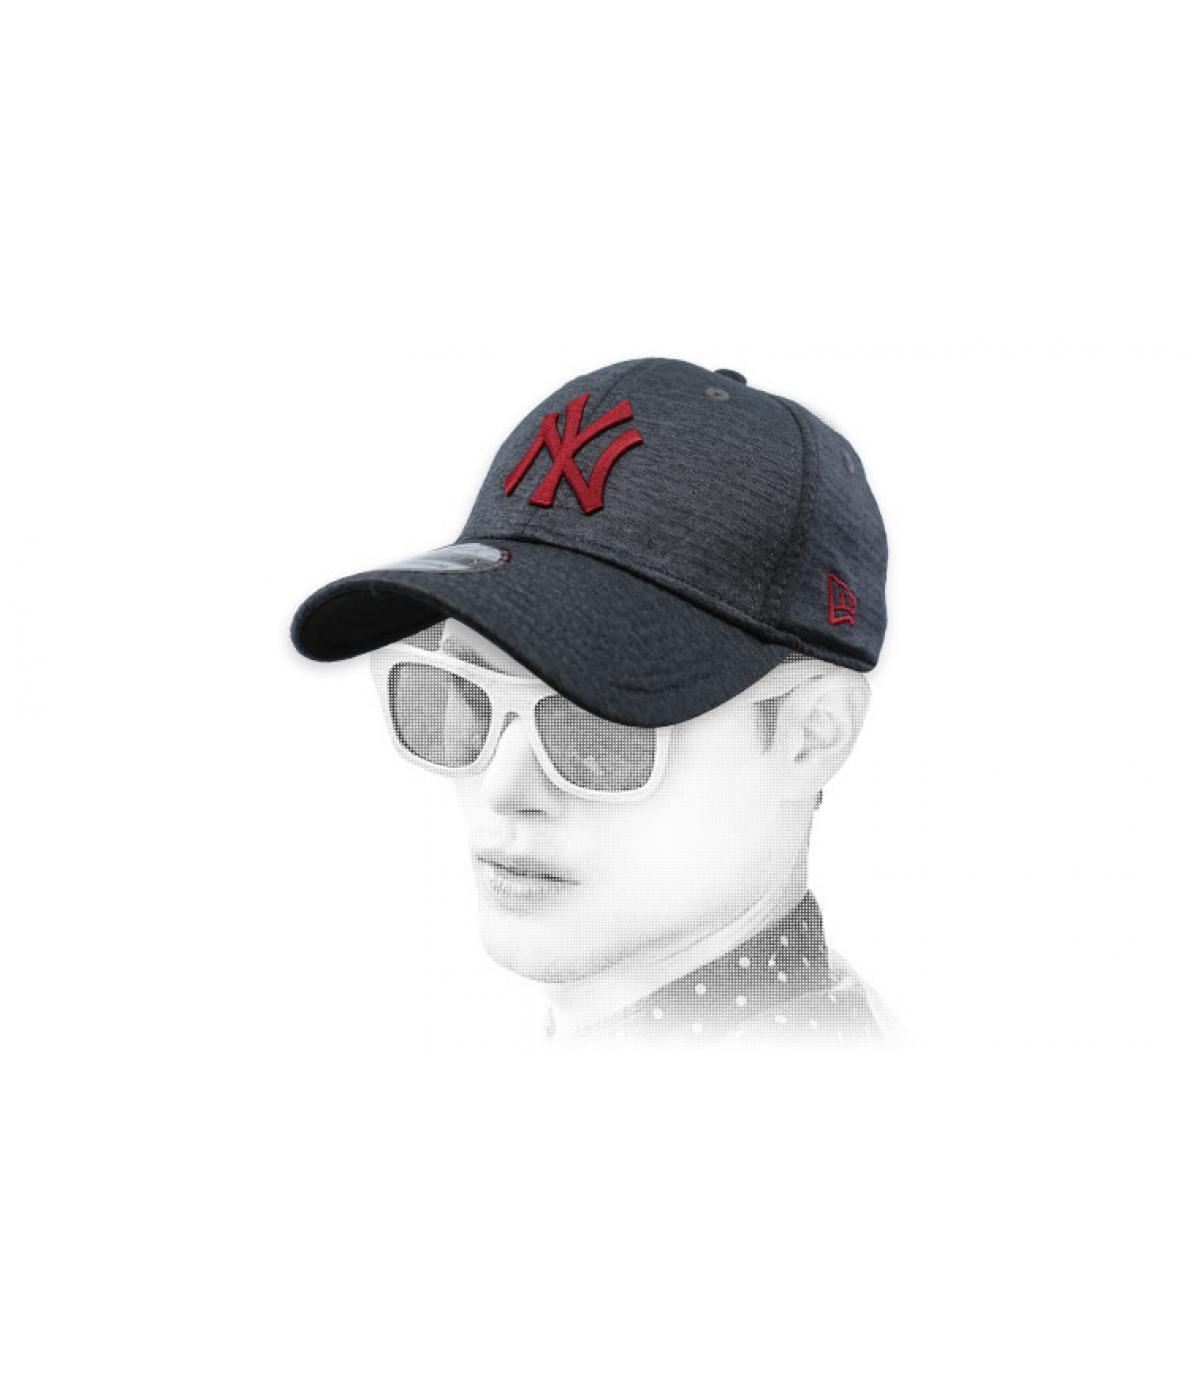 Cap NY schwarz grau